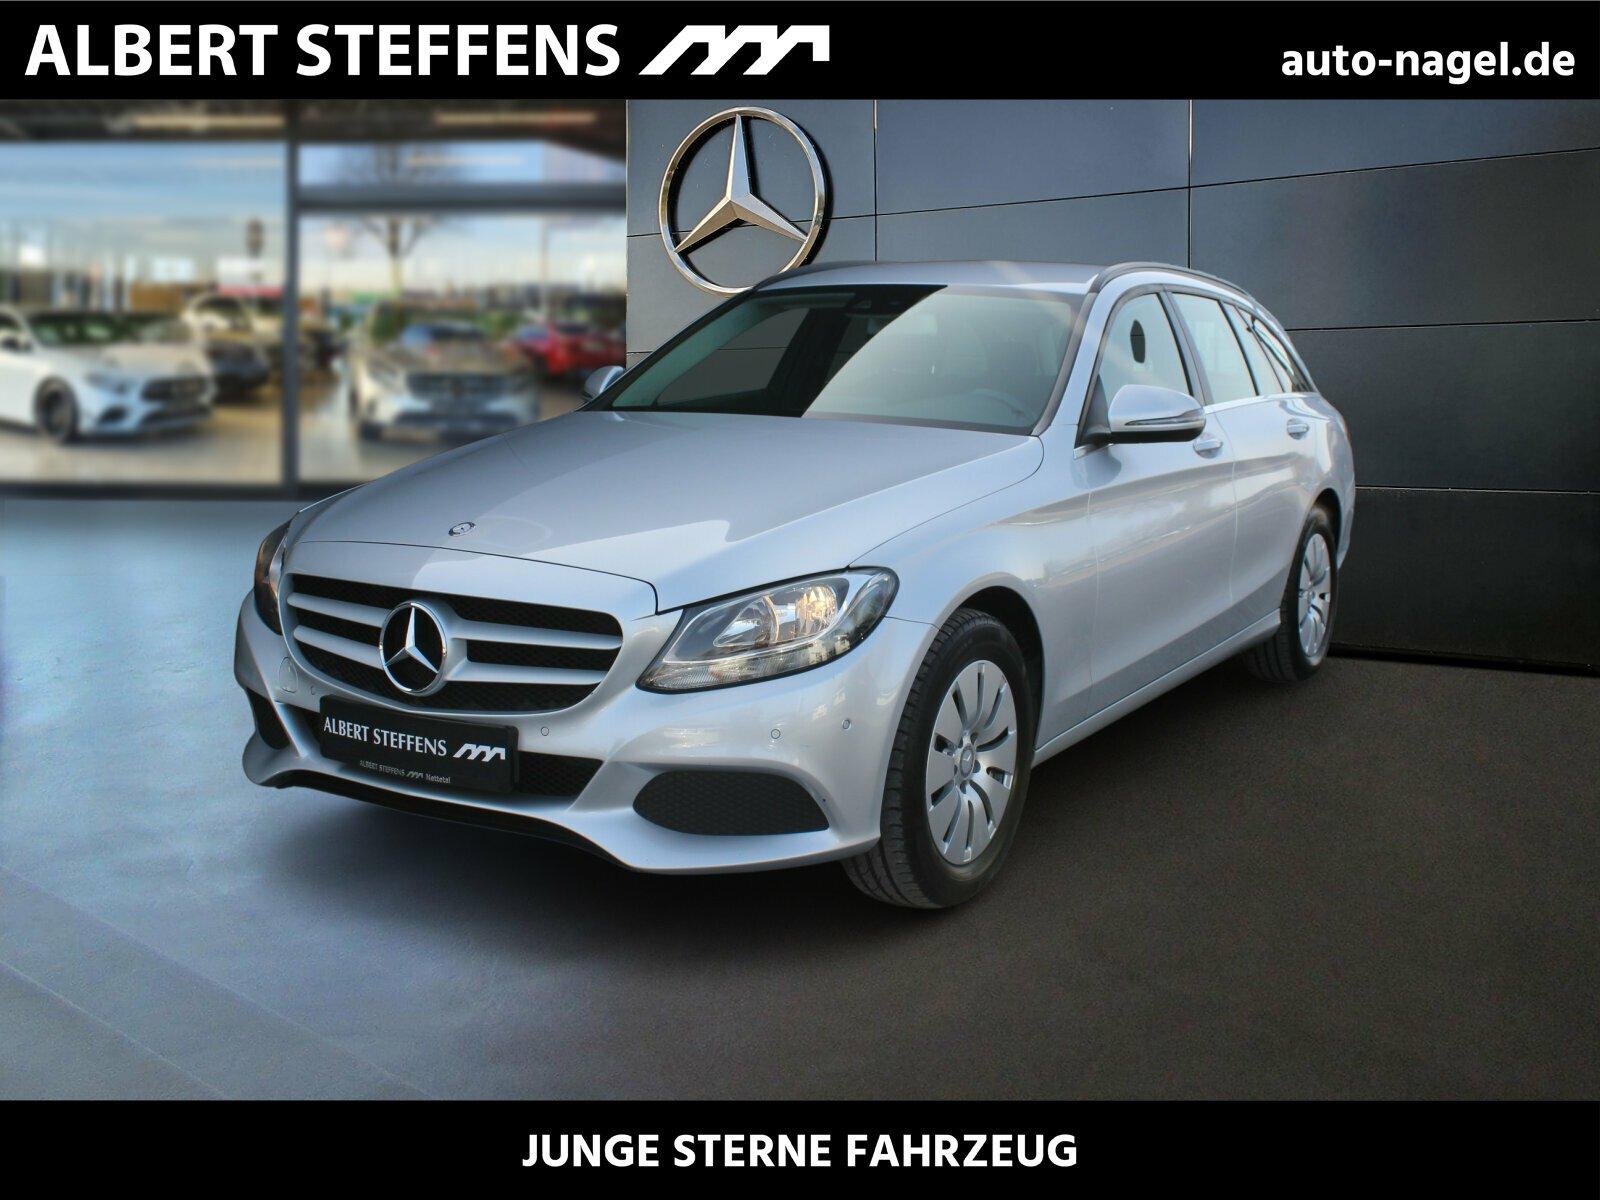 Mercedes-Benz C 220 d T +Sitzelektr.+NAVI+Sitzhz+PTS+CPA+ Navi, Jahr 2015, Diesel